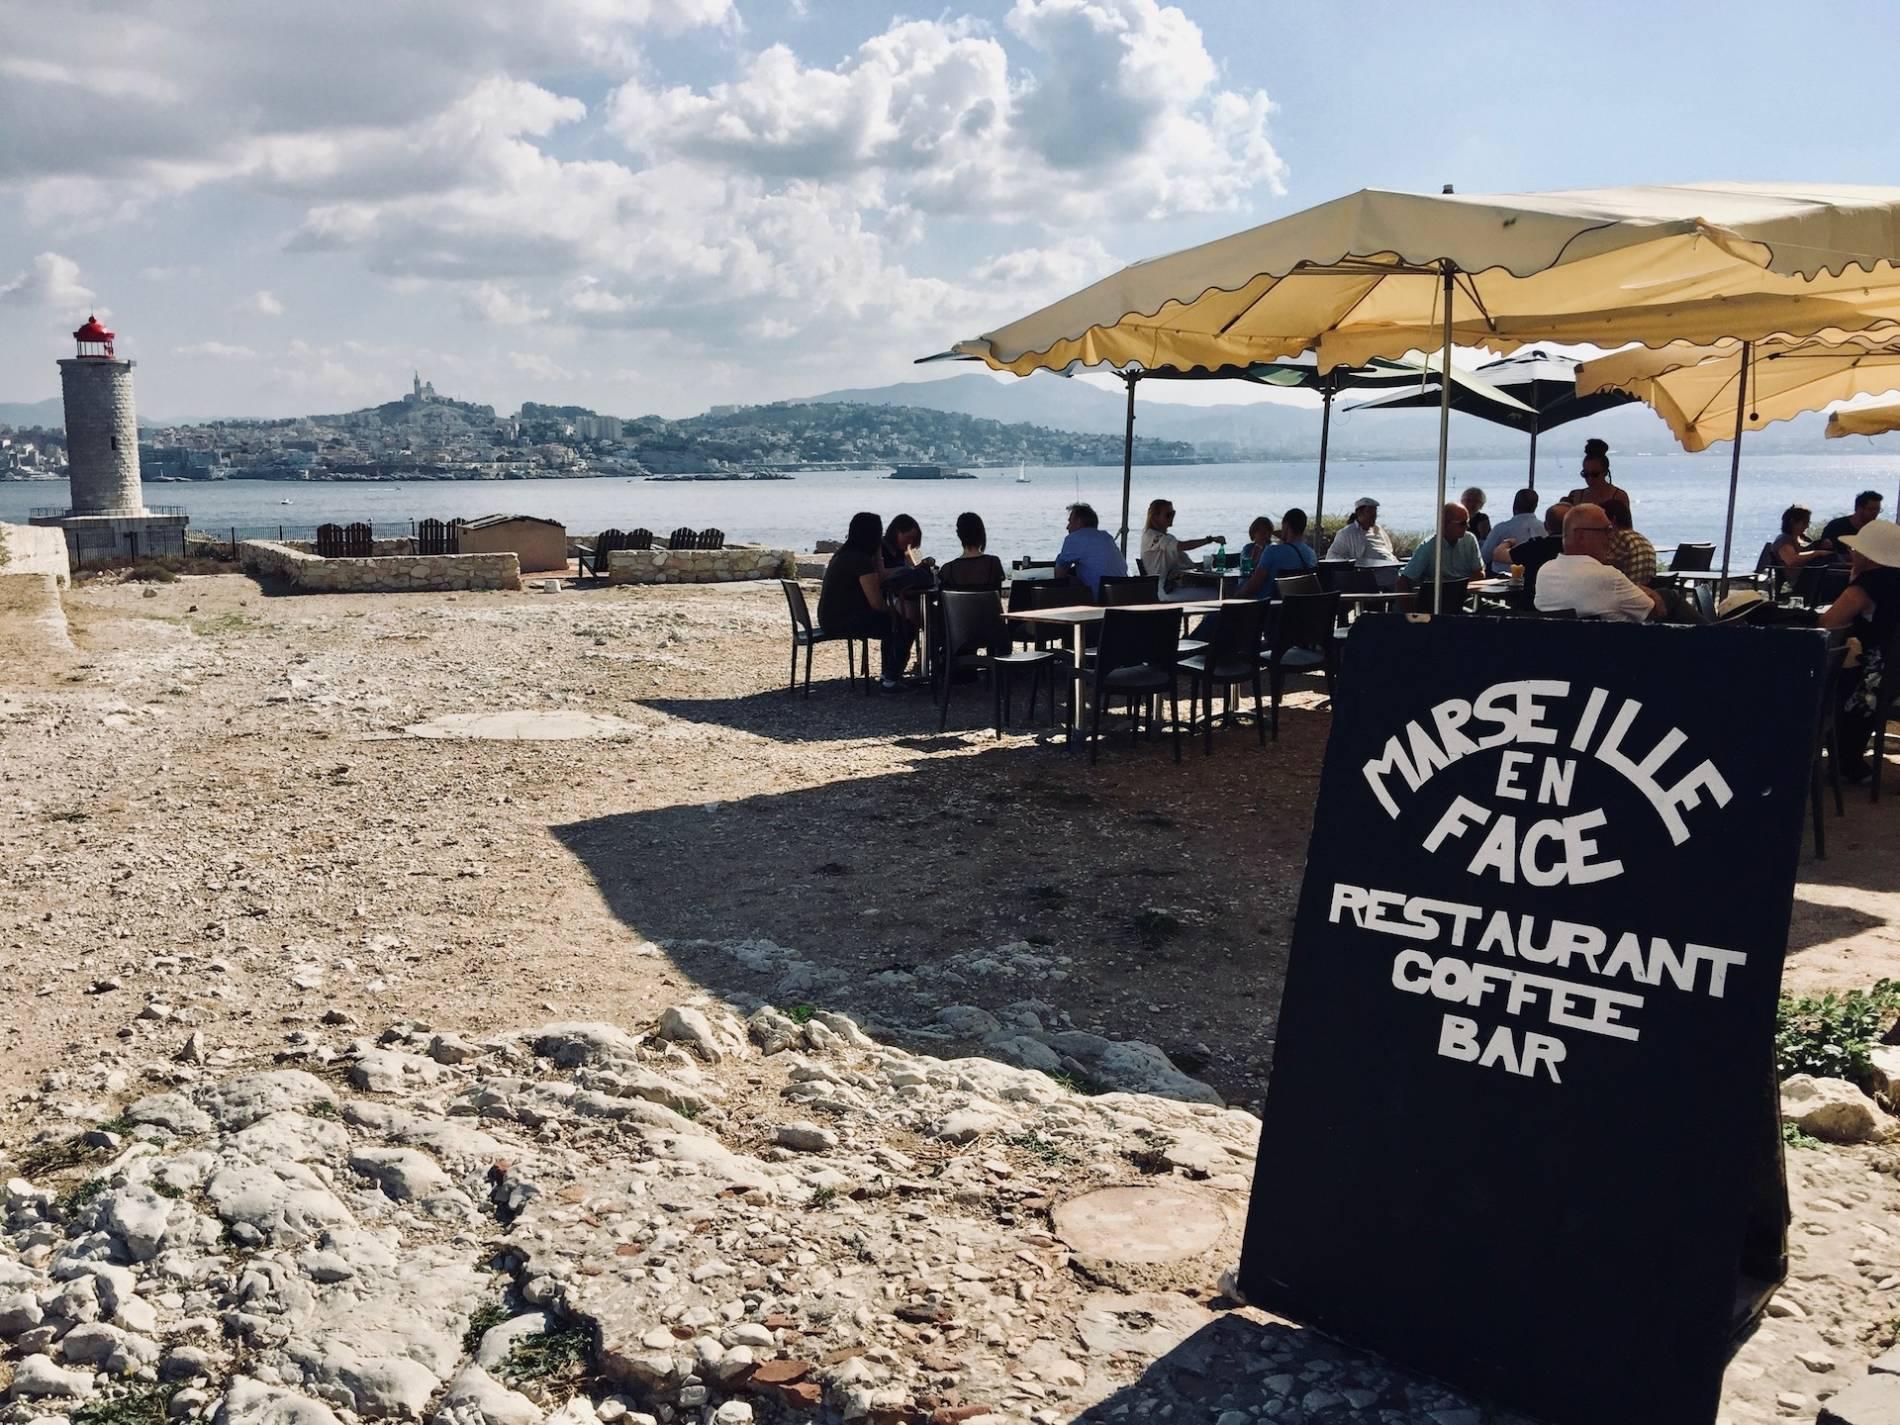 marseille-en-face-restaurant